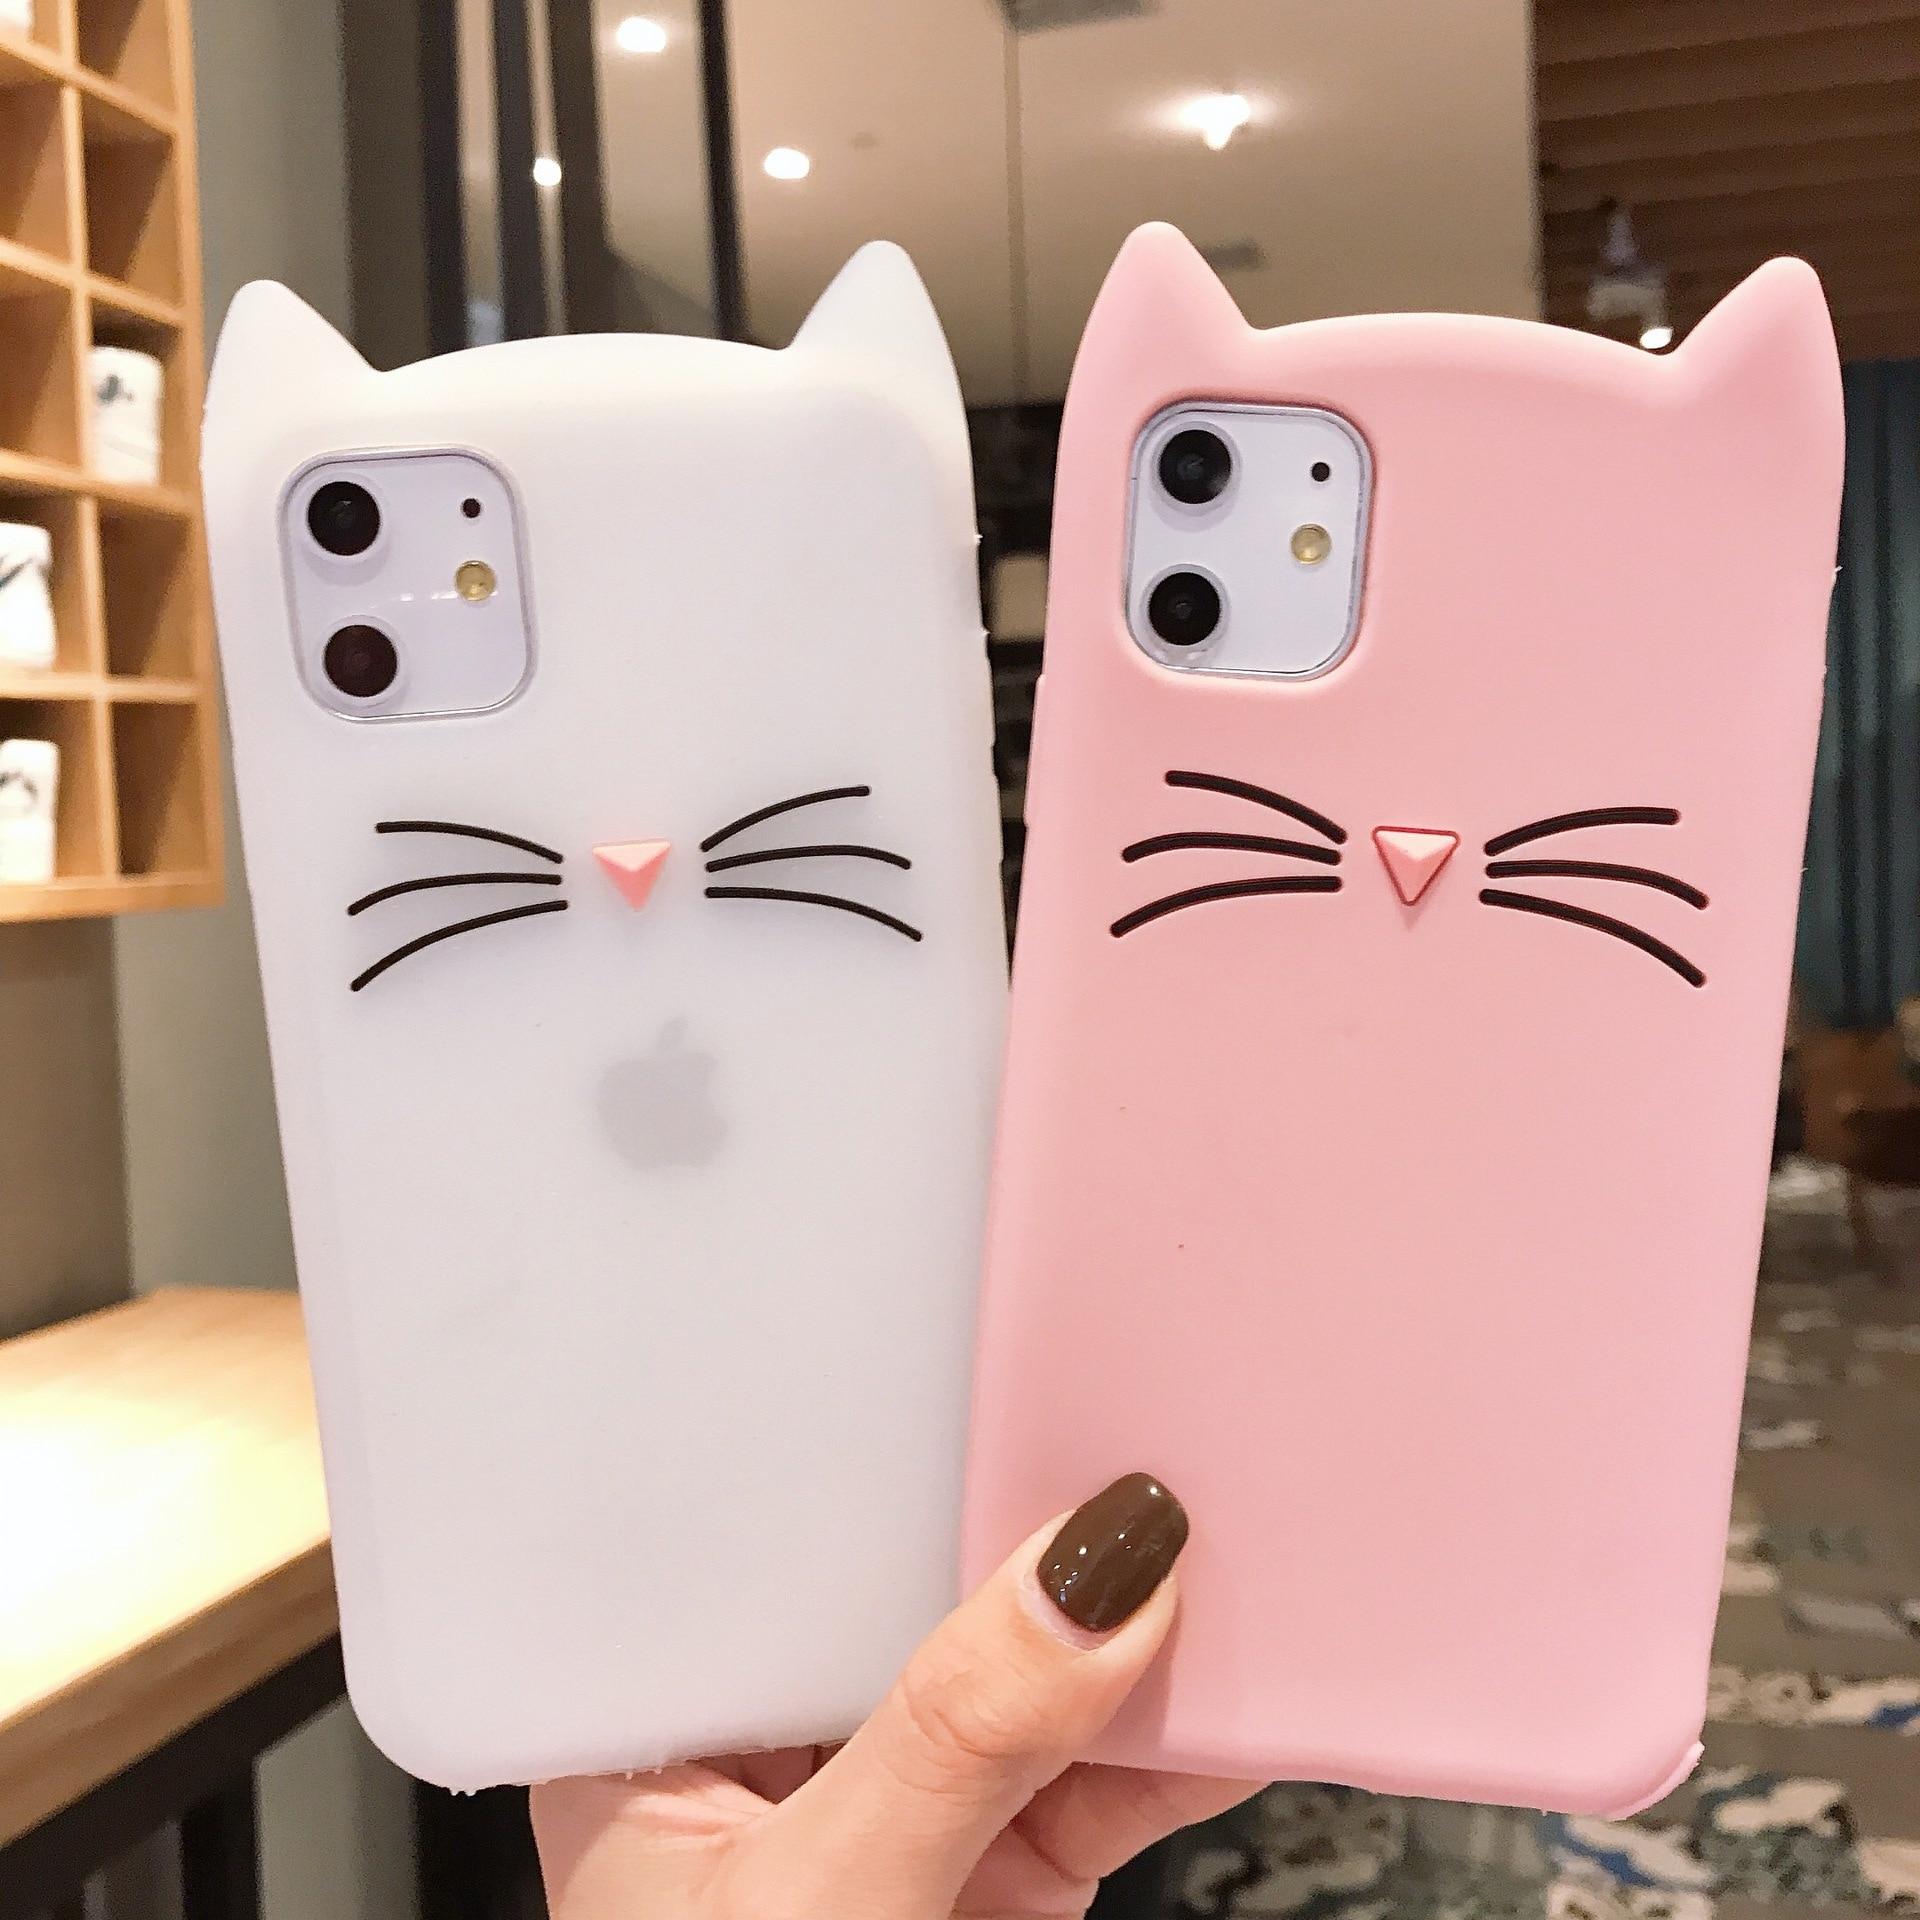 Linda funda de teléfono 3D Cat para iPhone11 Pro X XR XS Max 8 7pluse 6 6S suave funda de teléfono de silicona líquida Anti-caída encantadora funda negra